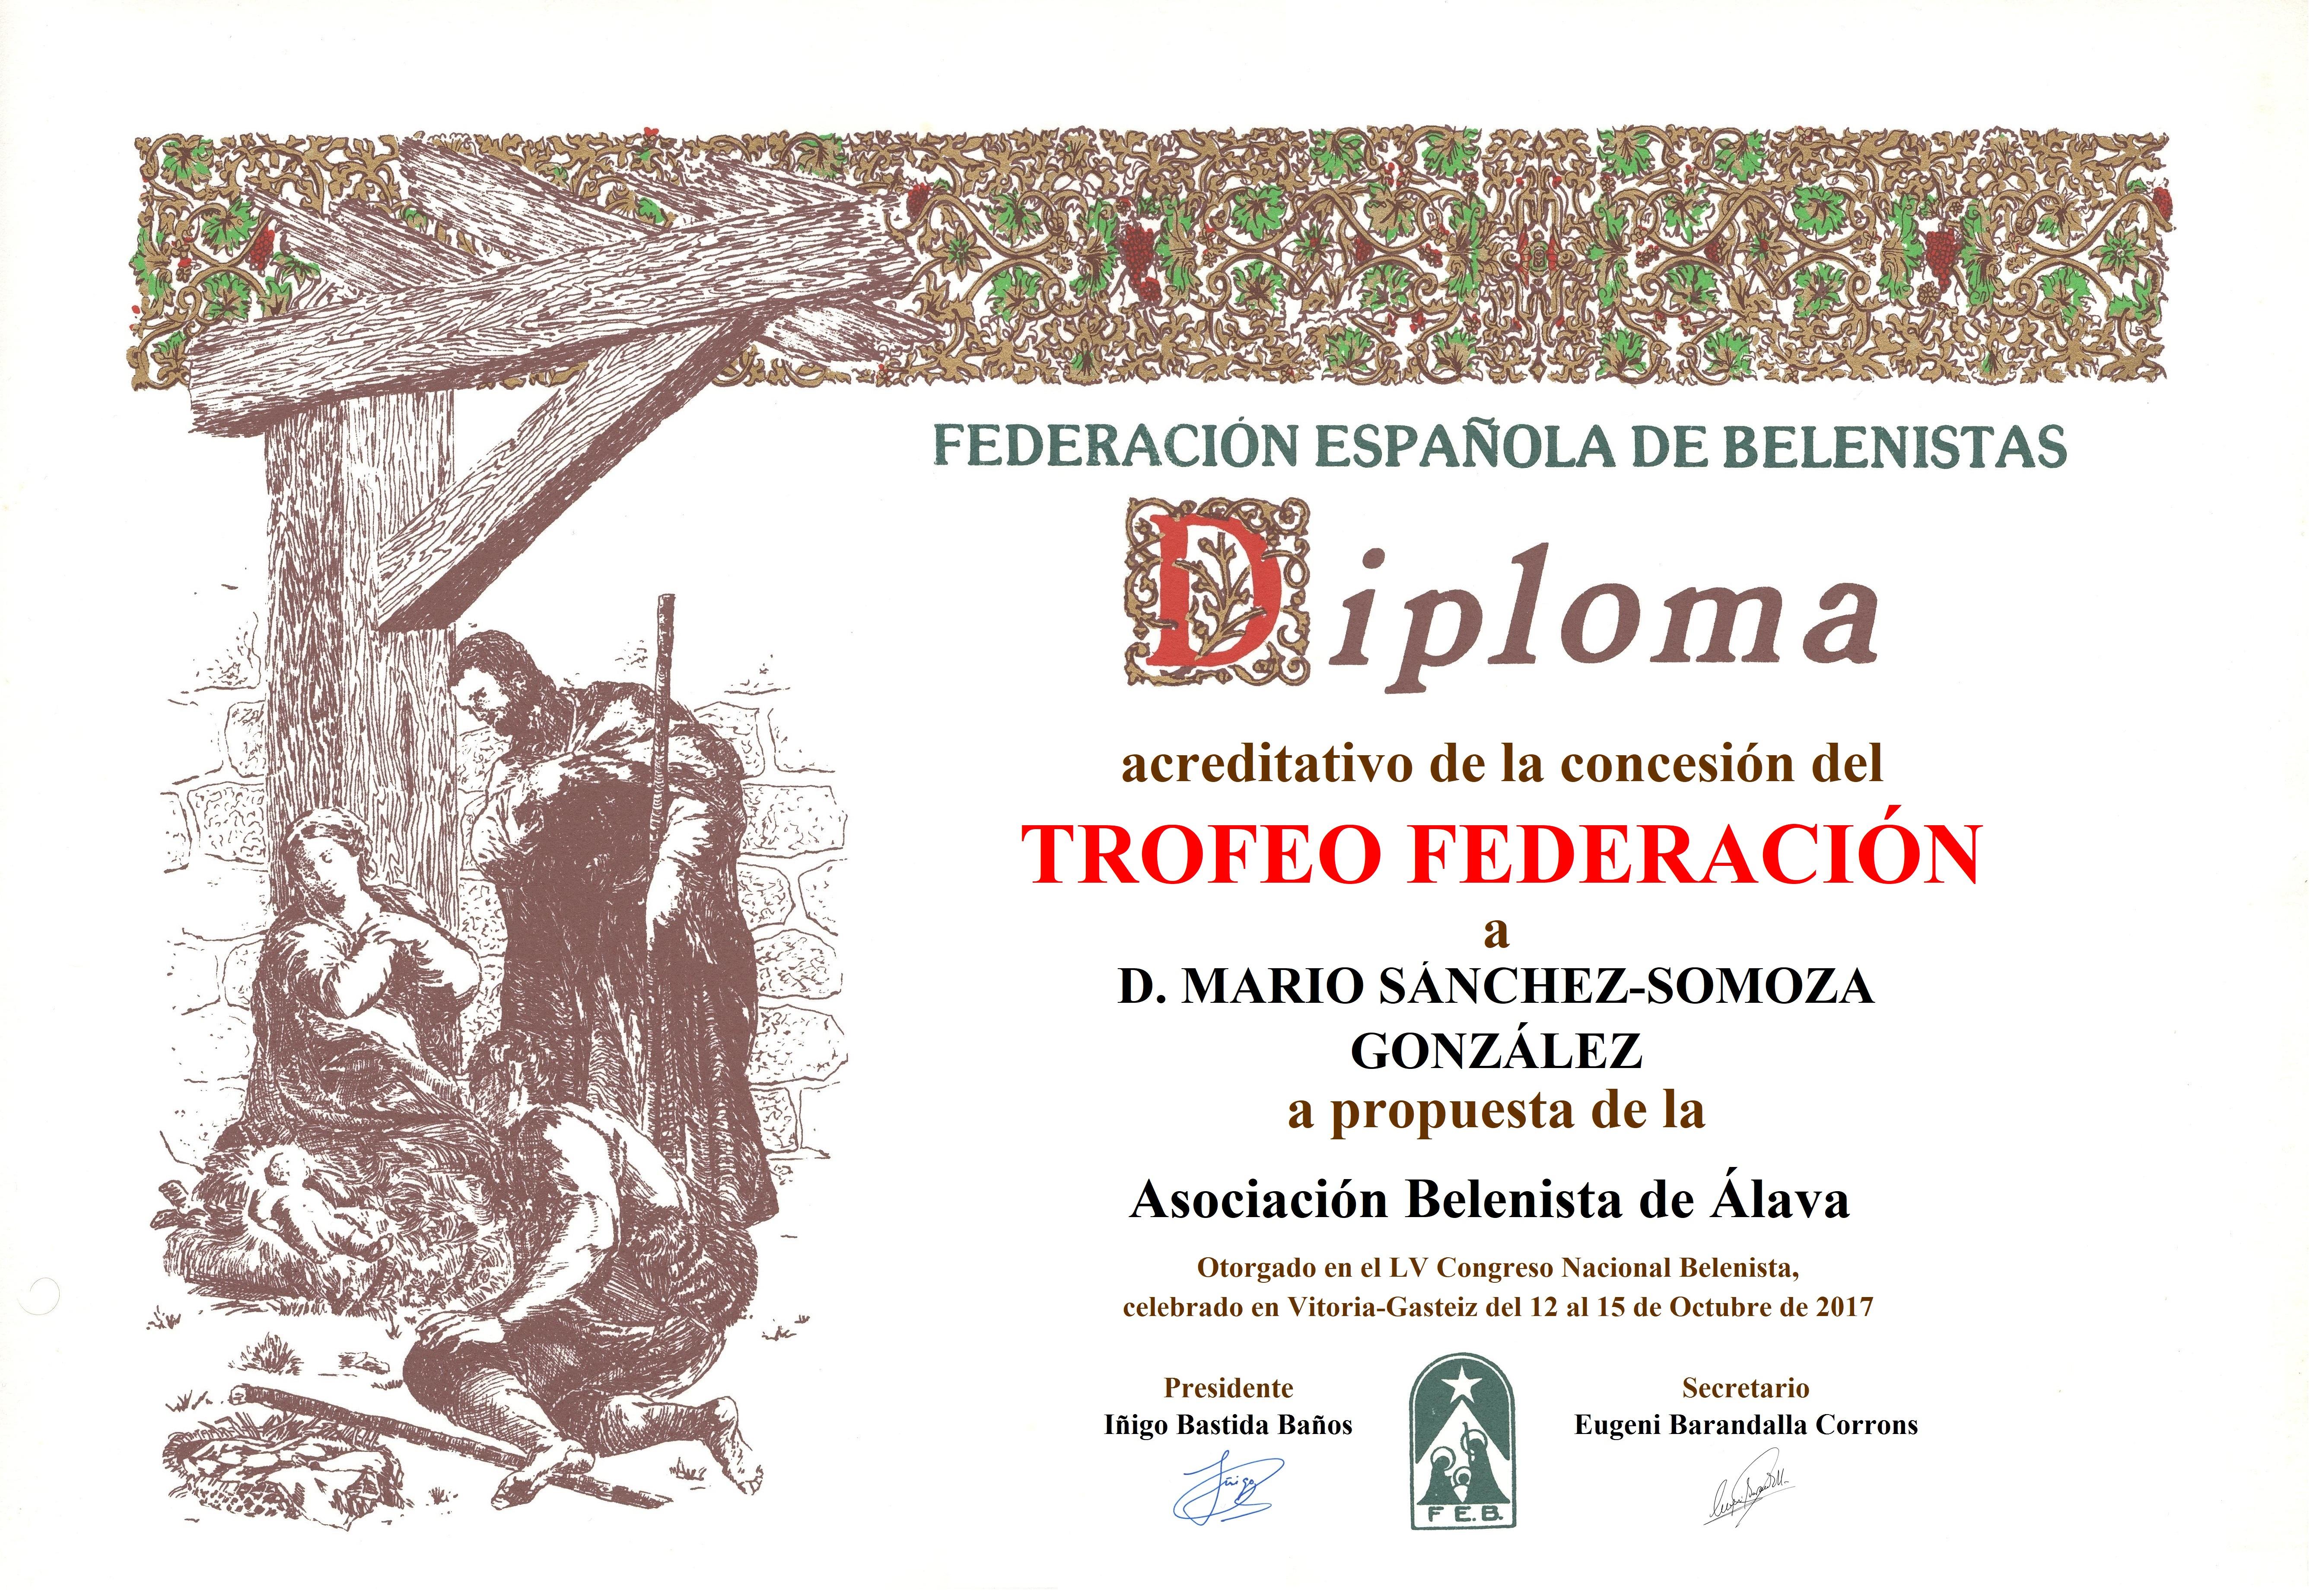 Mario Sánchez-Somoza González - Diploma Trofeo FEB 2017